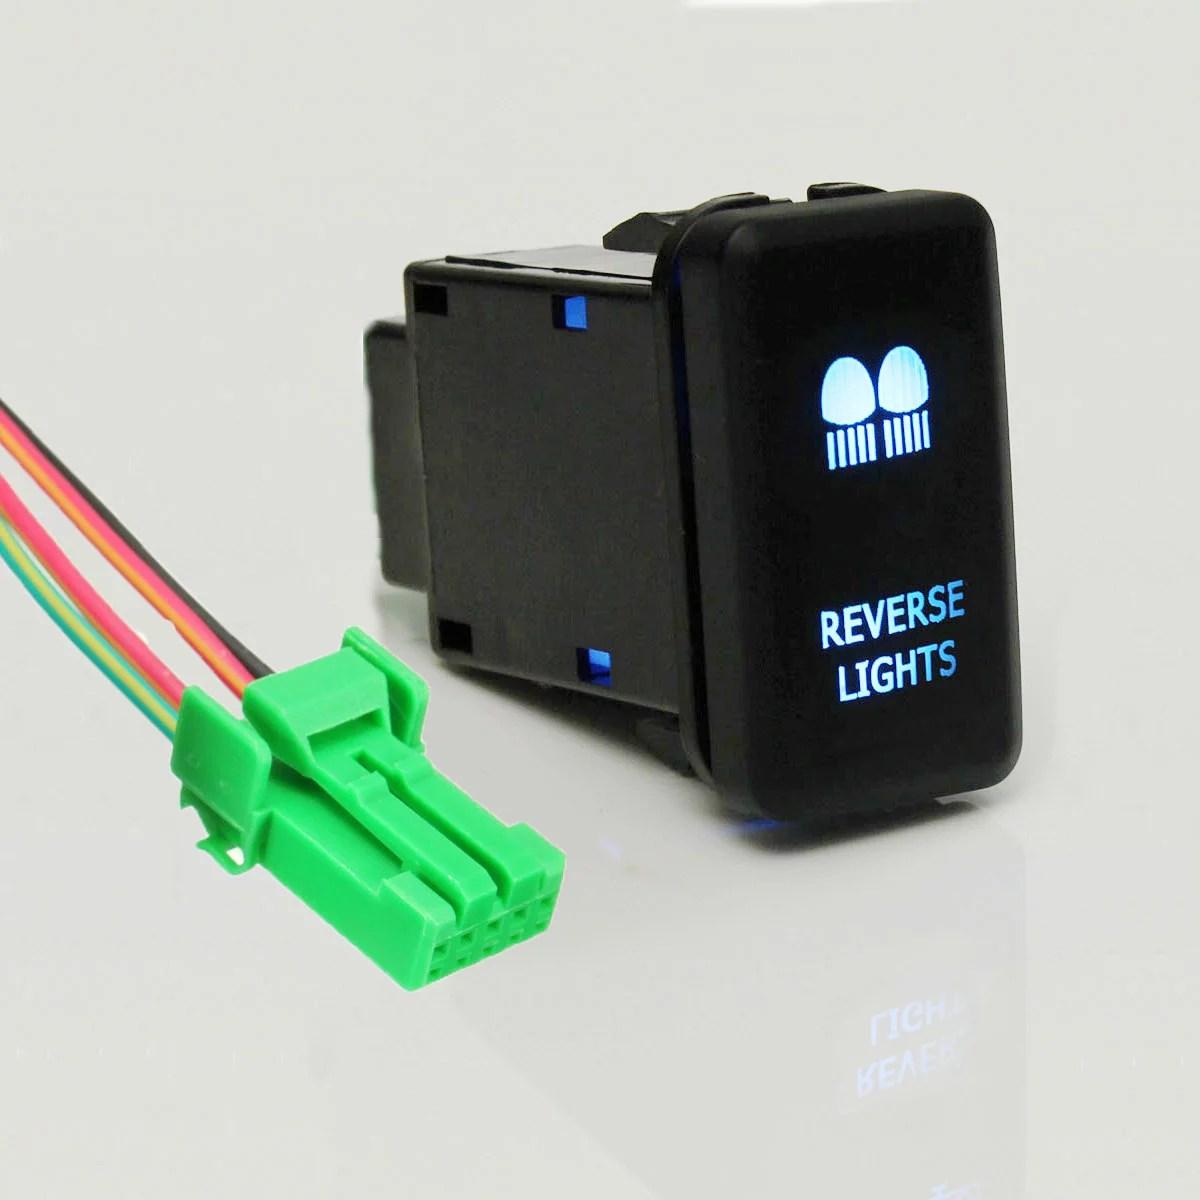 hight resolution of matcc 12v led blue light push button switch on off w 4 wire wiring harness for landcruiser hilux prado cruiser fj led light bar driving reverse spot work